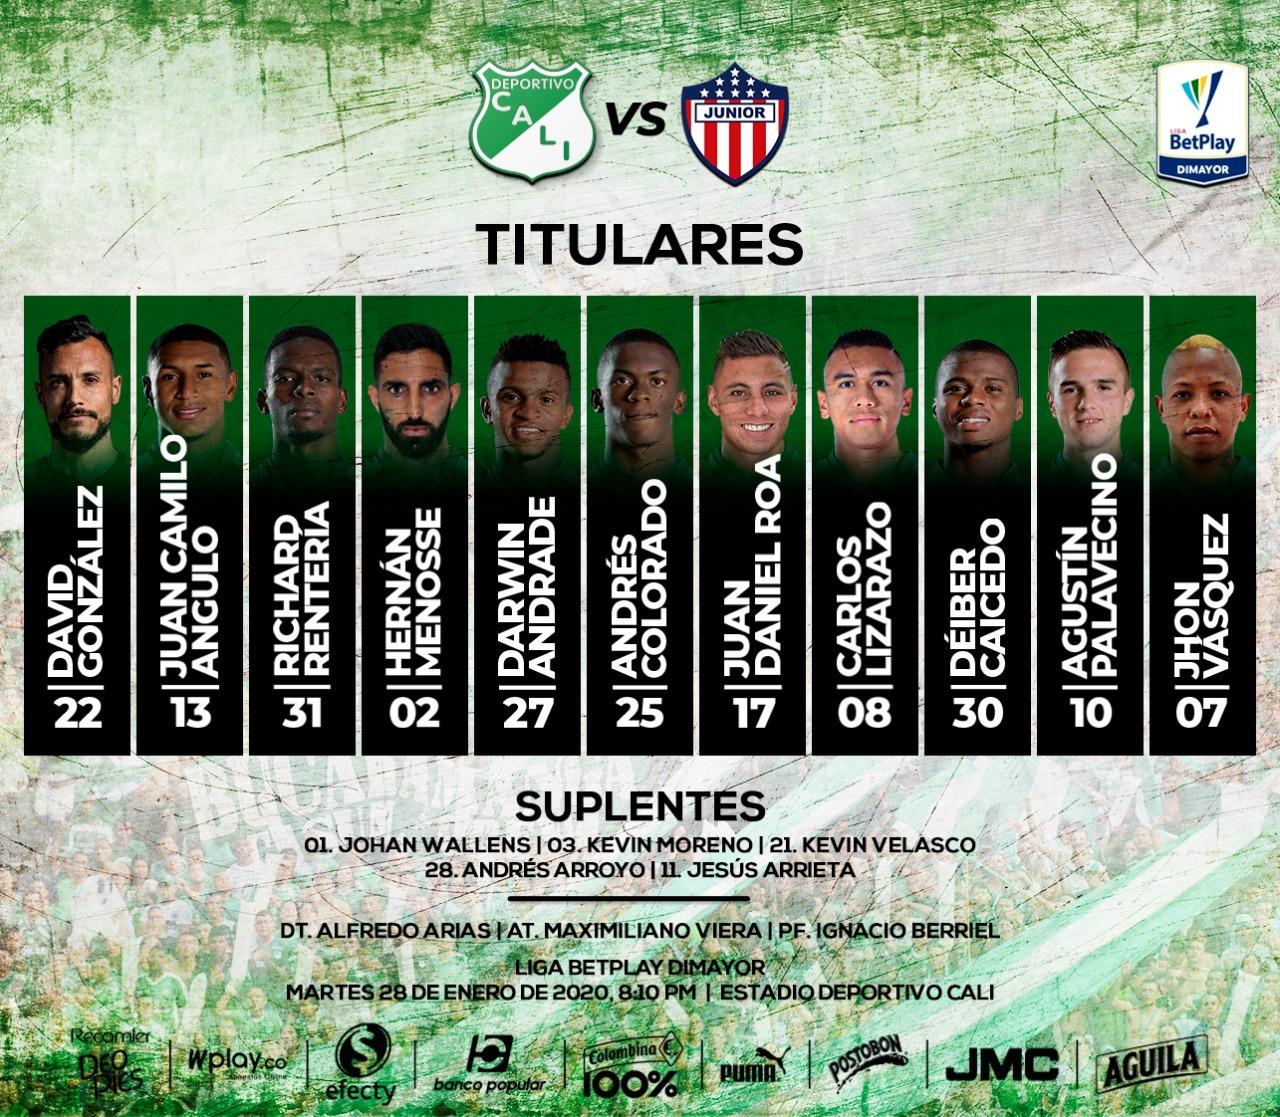 XI Deportivo Cali